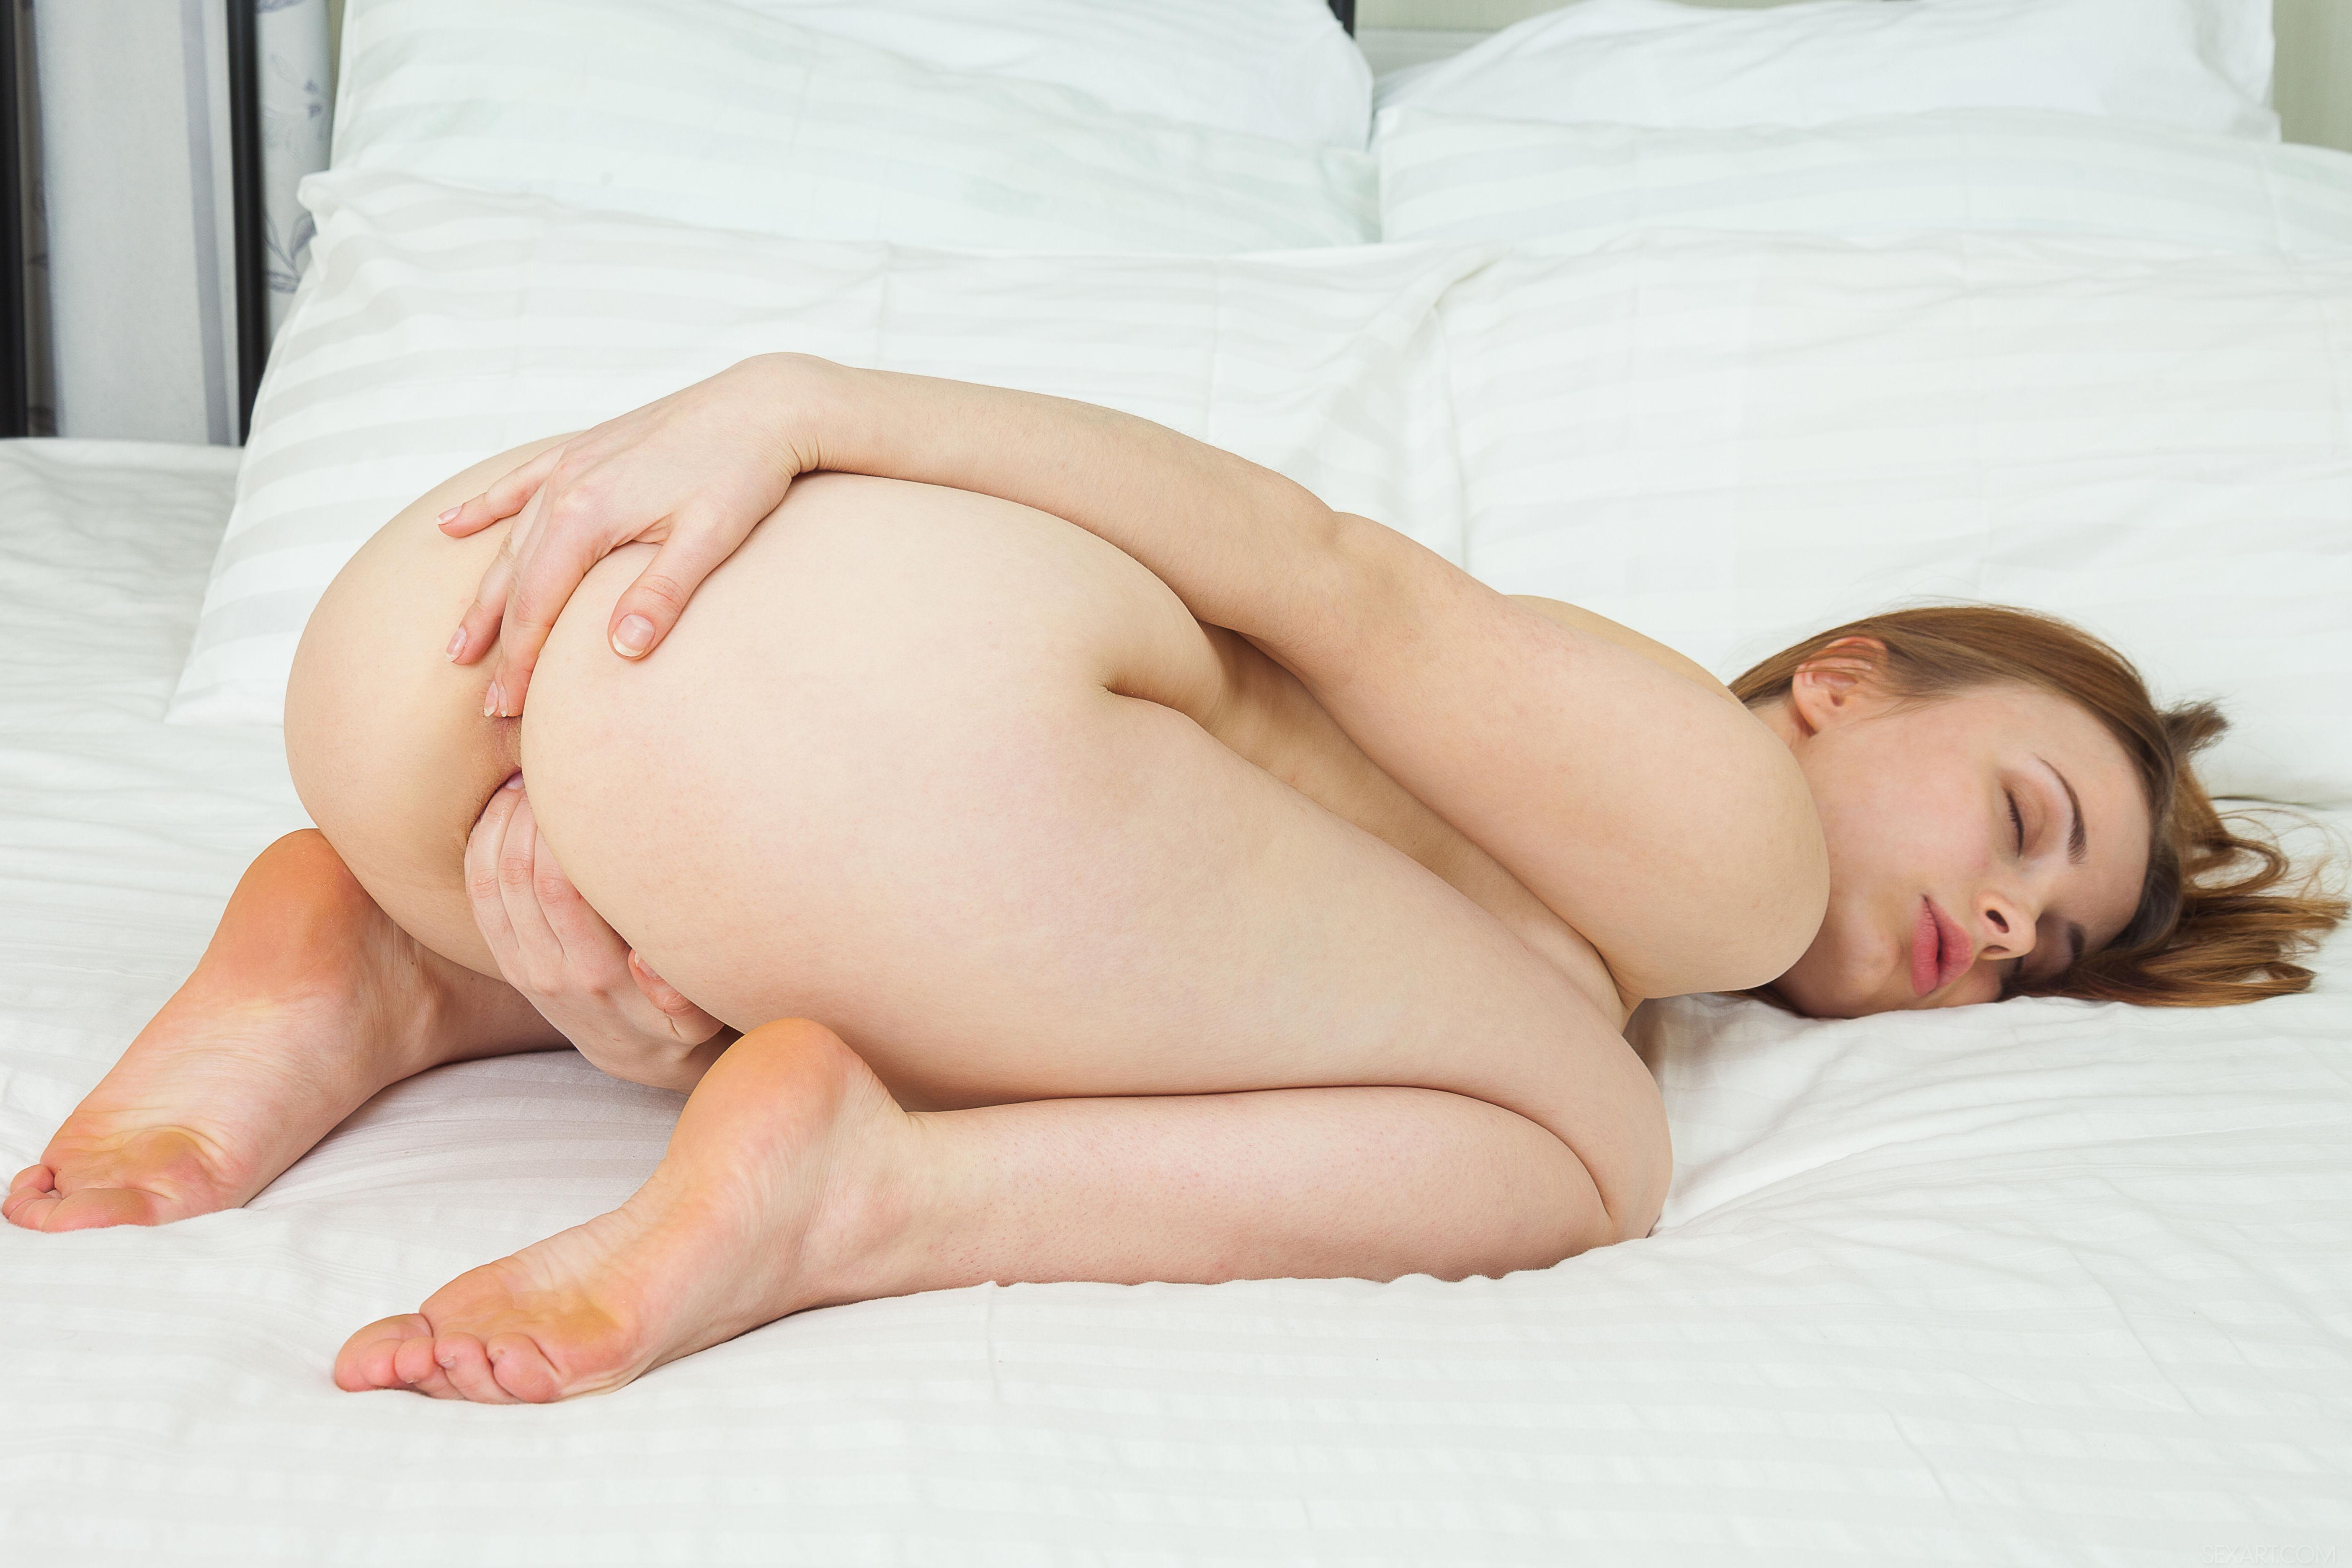 kak-ponyat-chto-devushka-masturbiruet